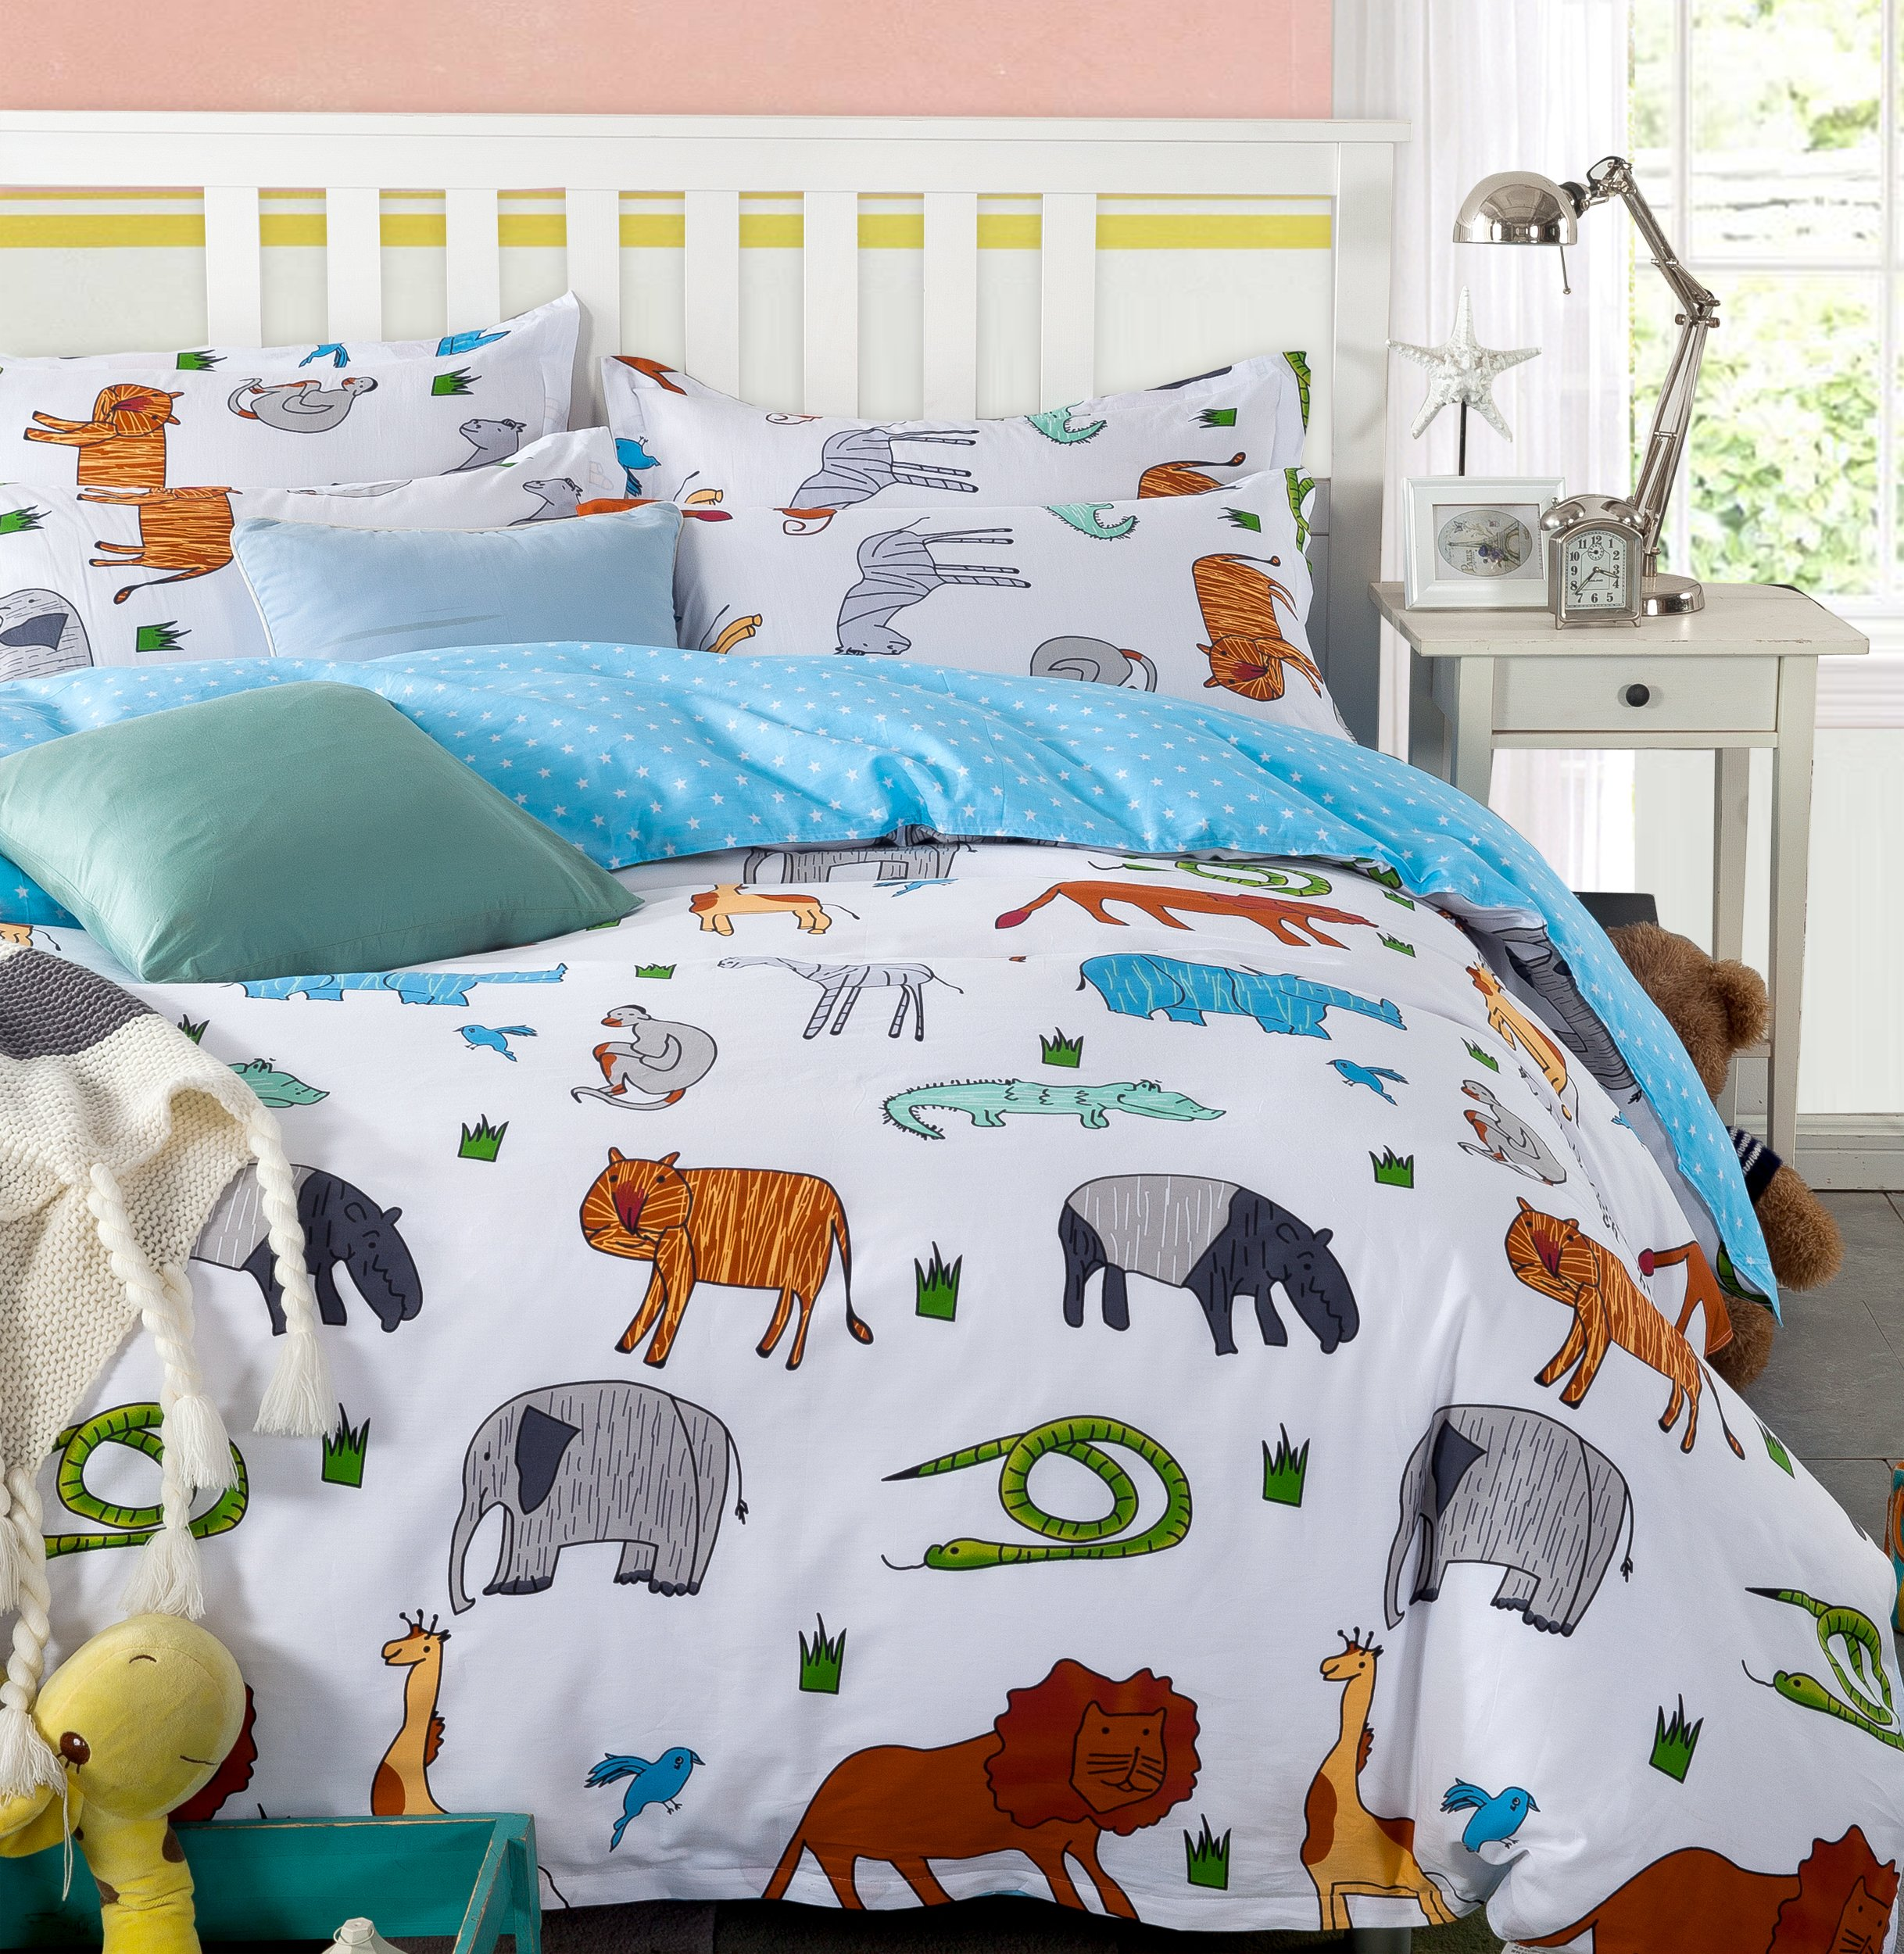 LELVA Cartoon Bedding Set Animal Print Duvet Cover Set Kids Bedding for Girls and Boys Children's Bedding (Queen, Fitted Sheet Set)